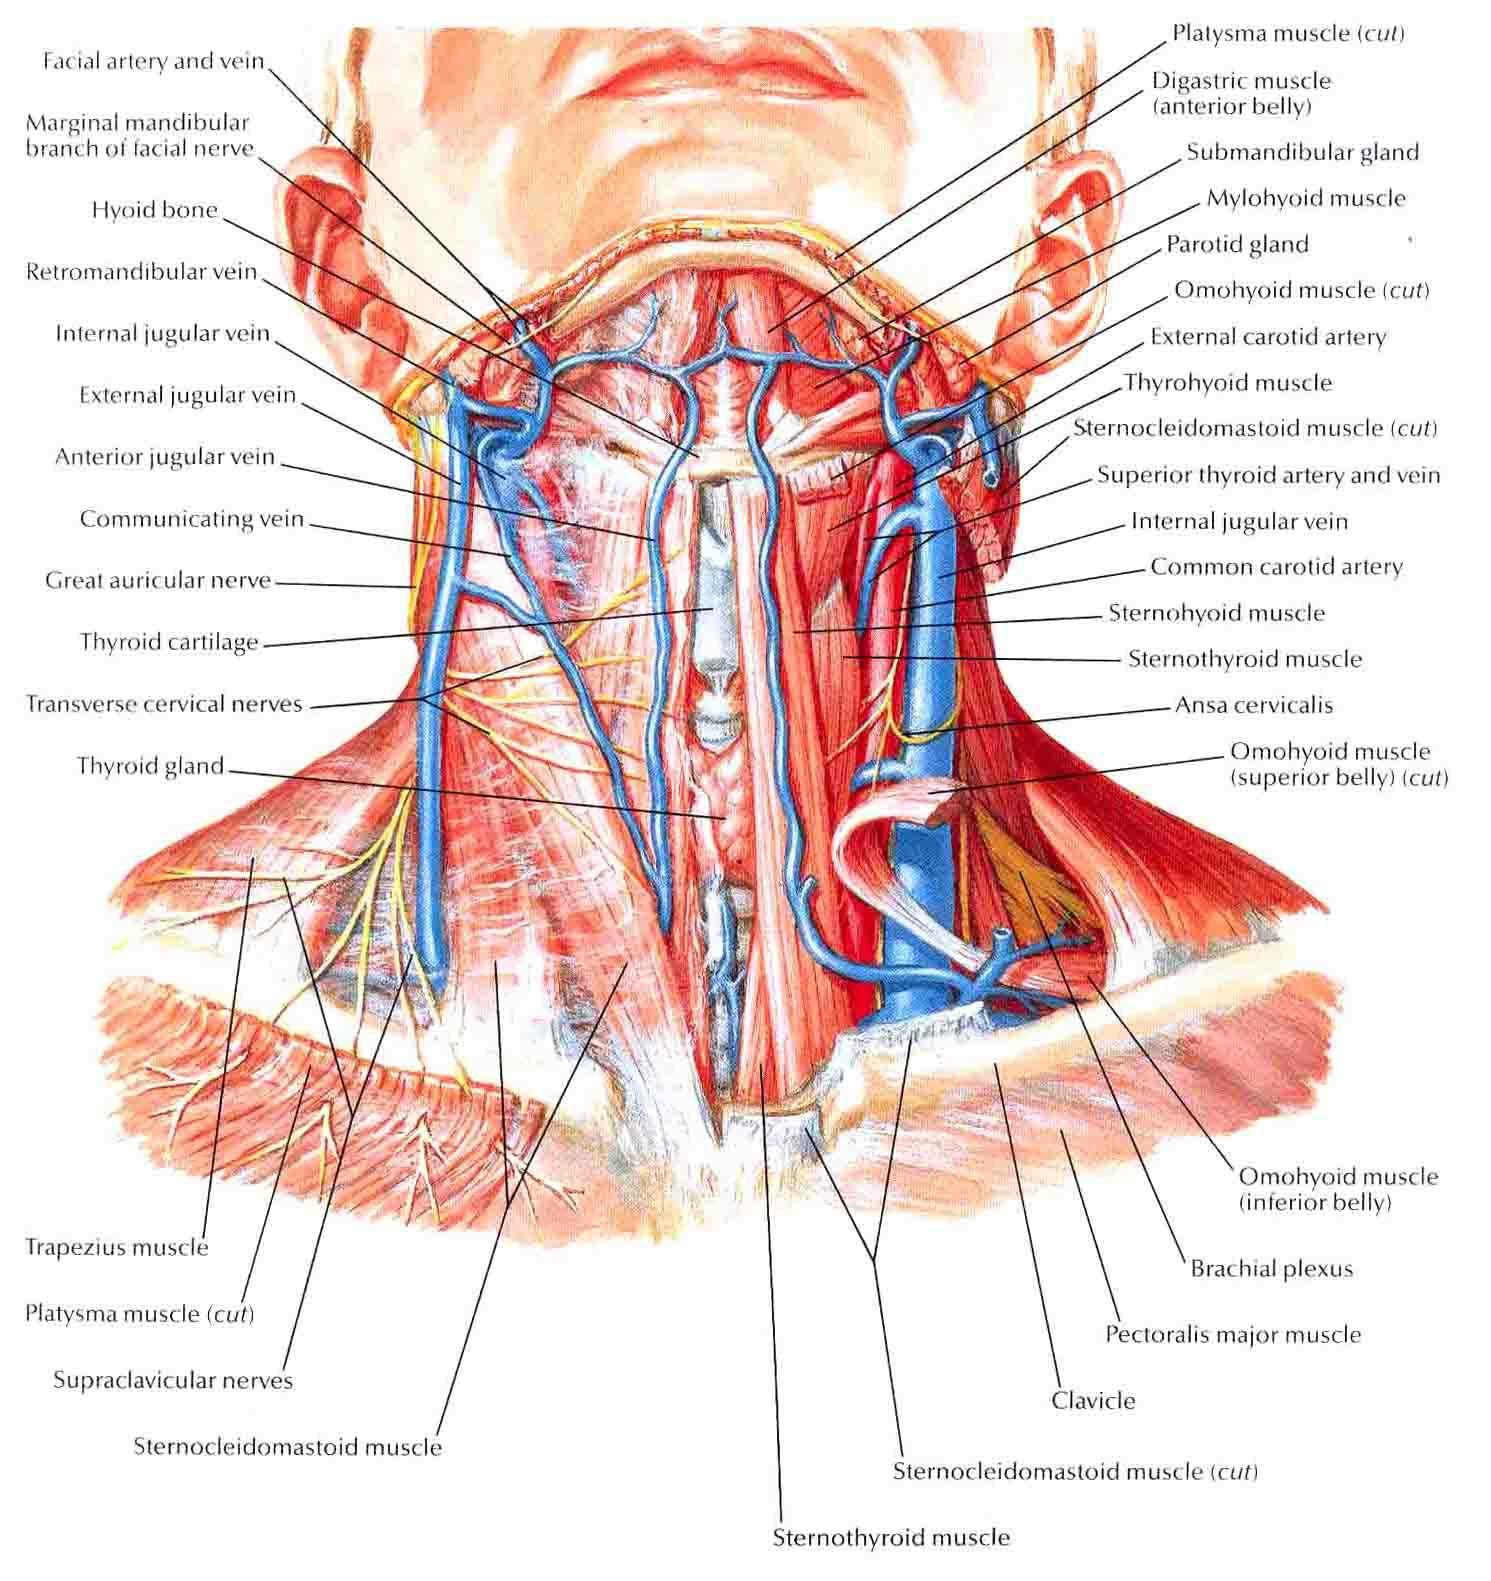 medium resolution of human neck muscles diagram human anatomy drawing pinterest rh pinterest com human body nerve system diagram nerves of the human arm